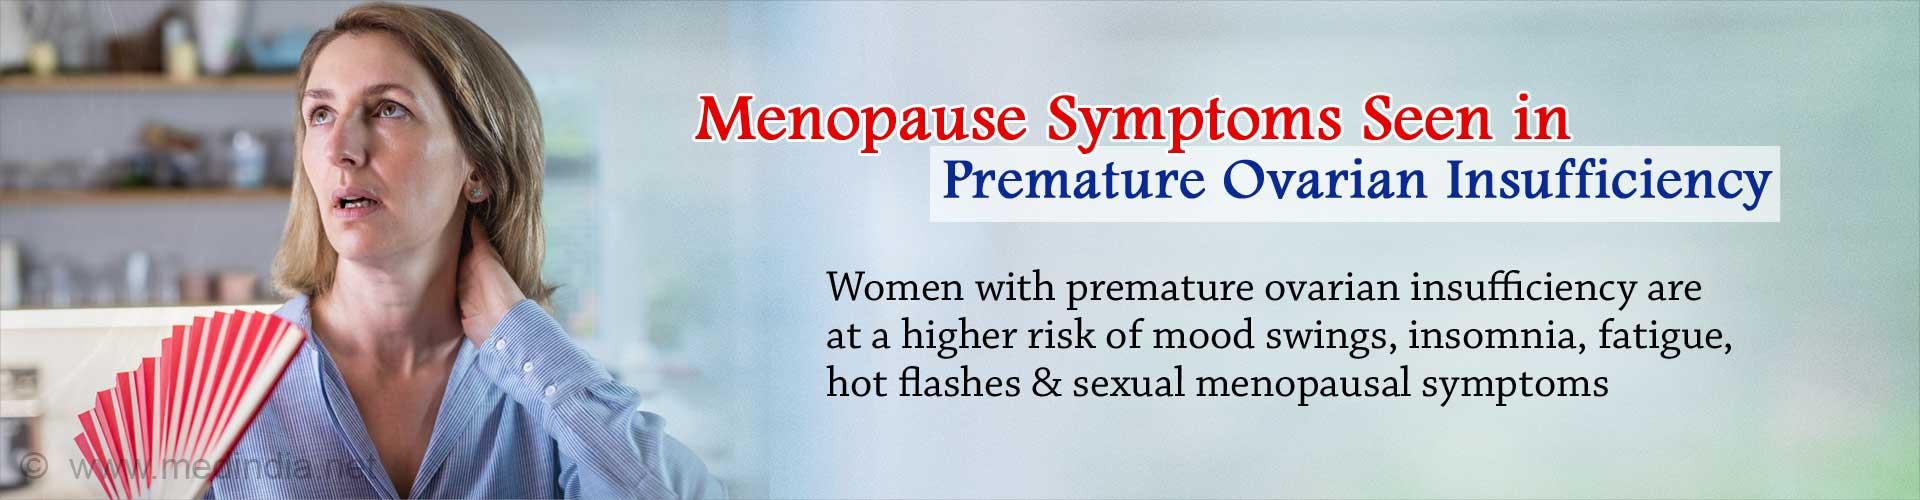 Severe Menopause Symptoms Seen in Premature Ovarian Insufficiency